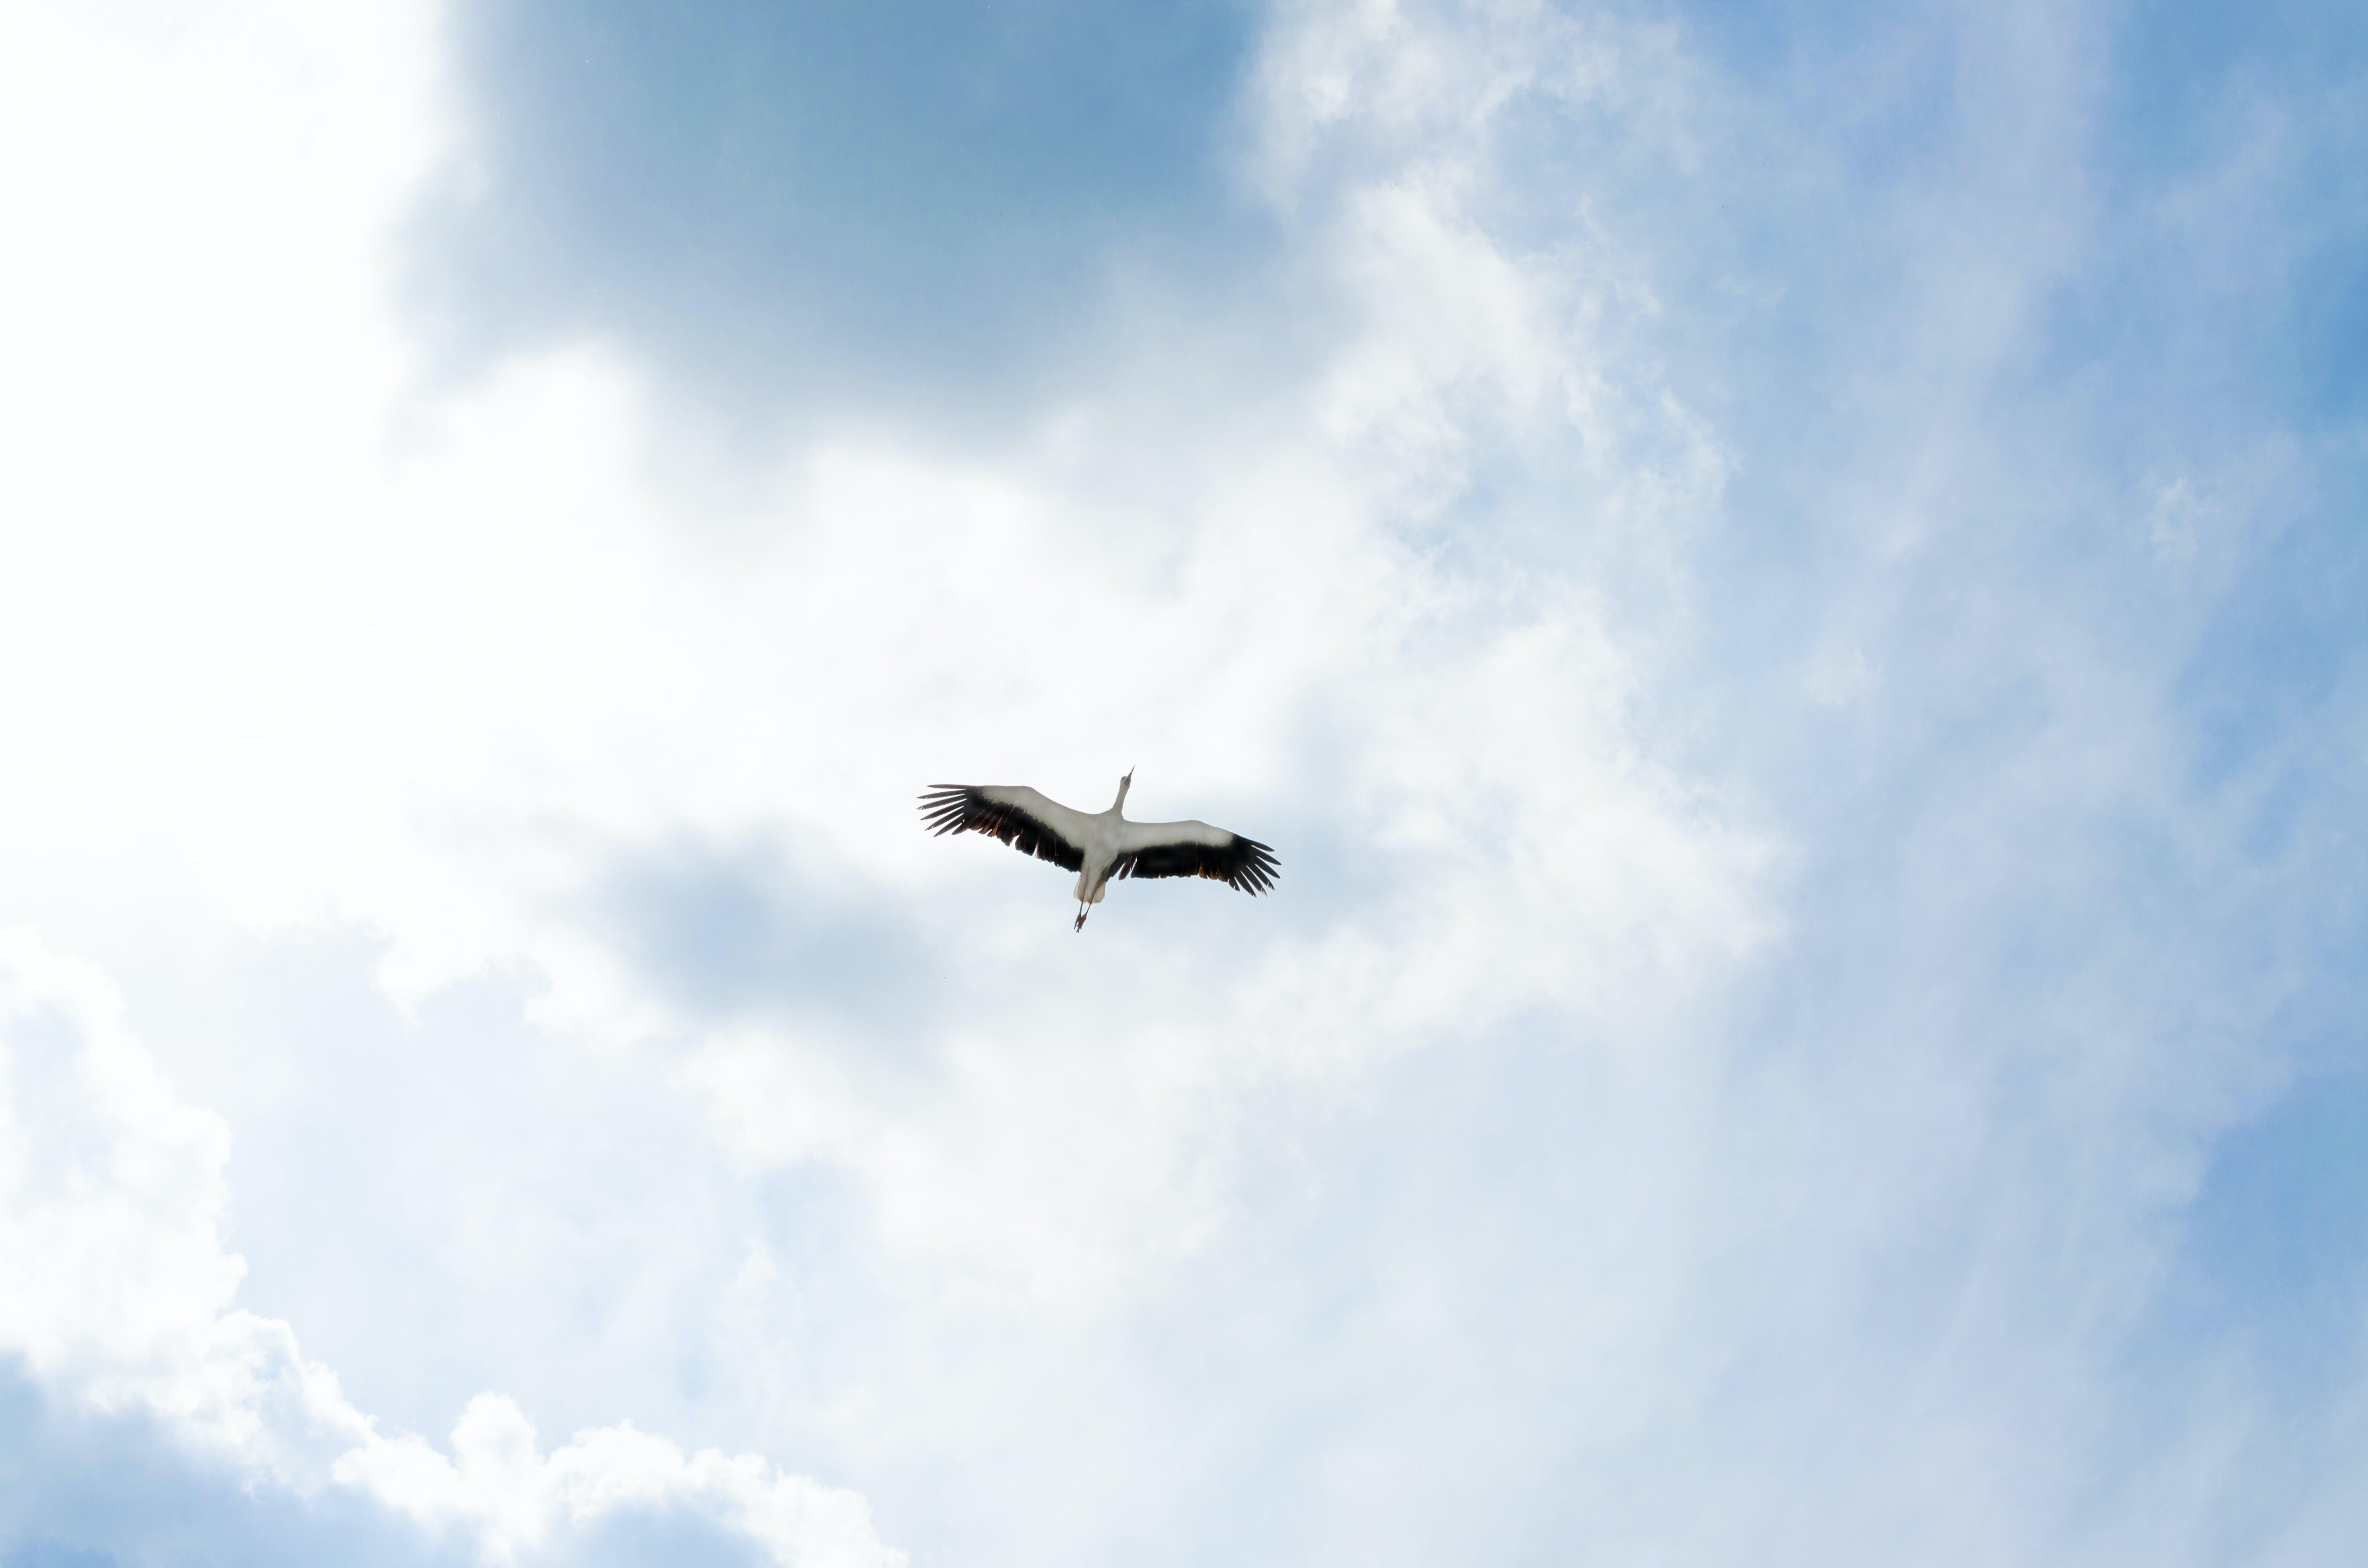 air, animal, aviation